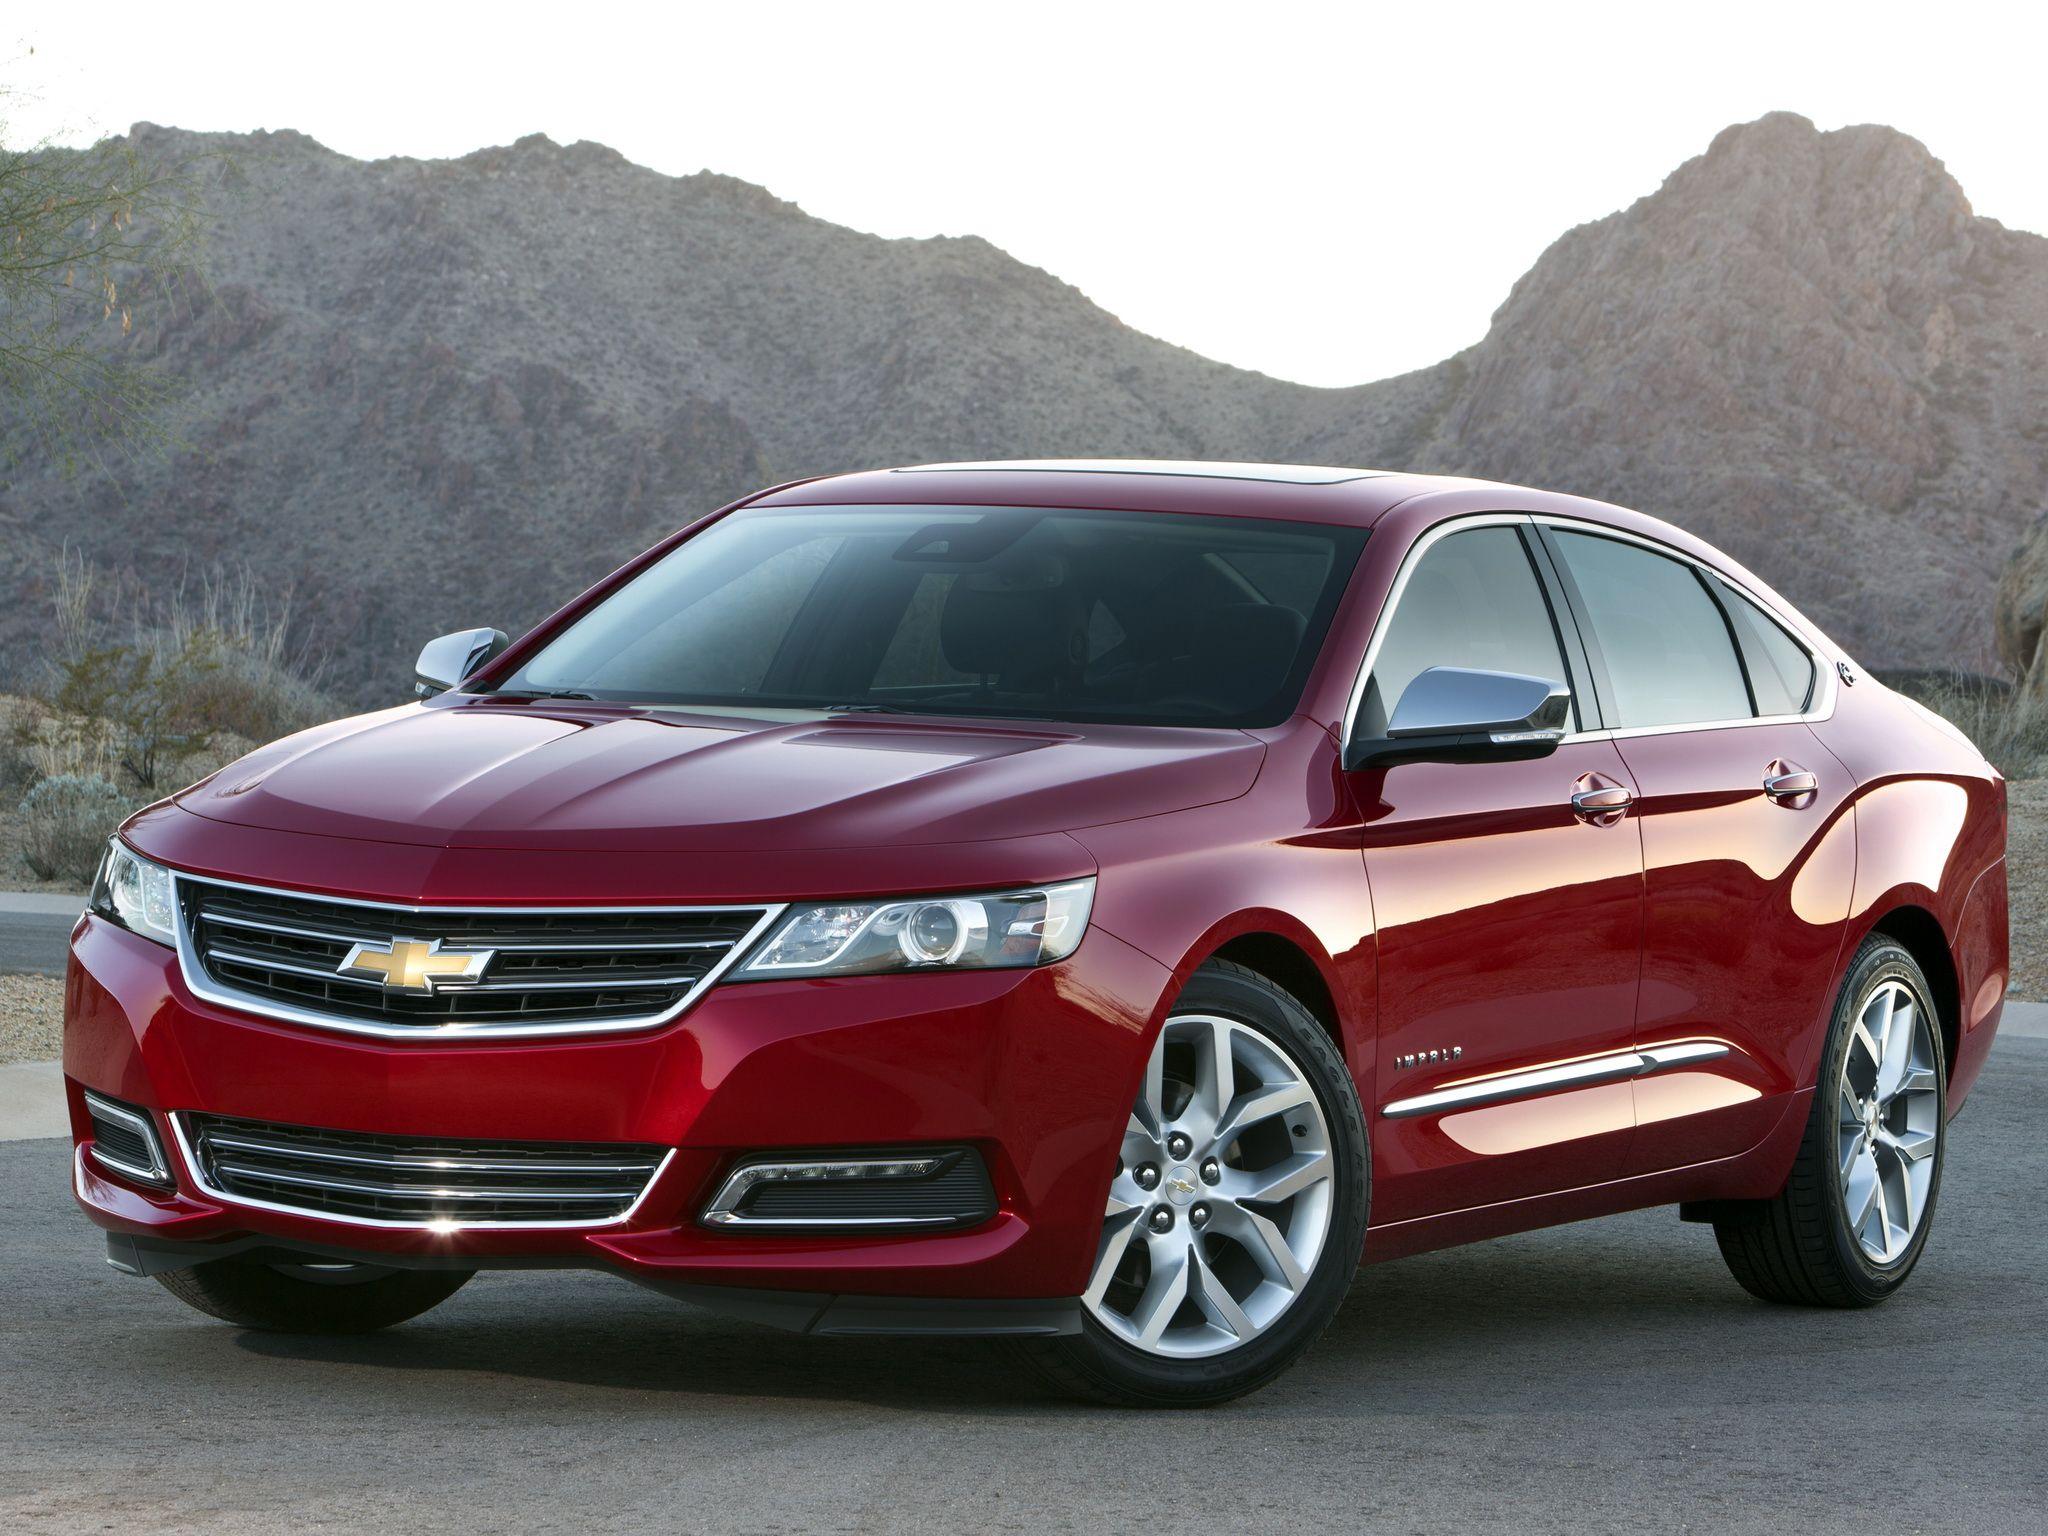 medium resolution of 2013 impala ltz chevrolet impala ltz 2013